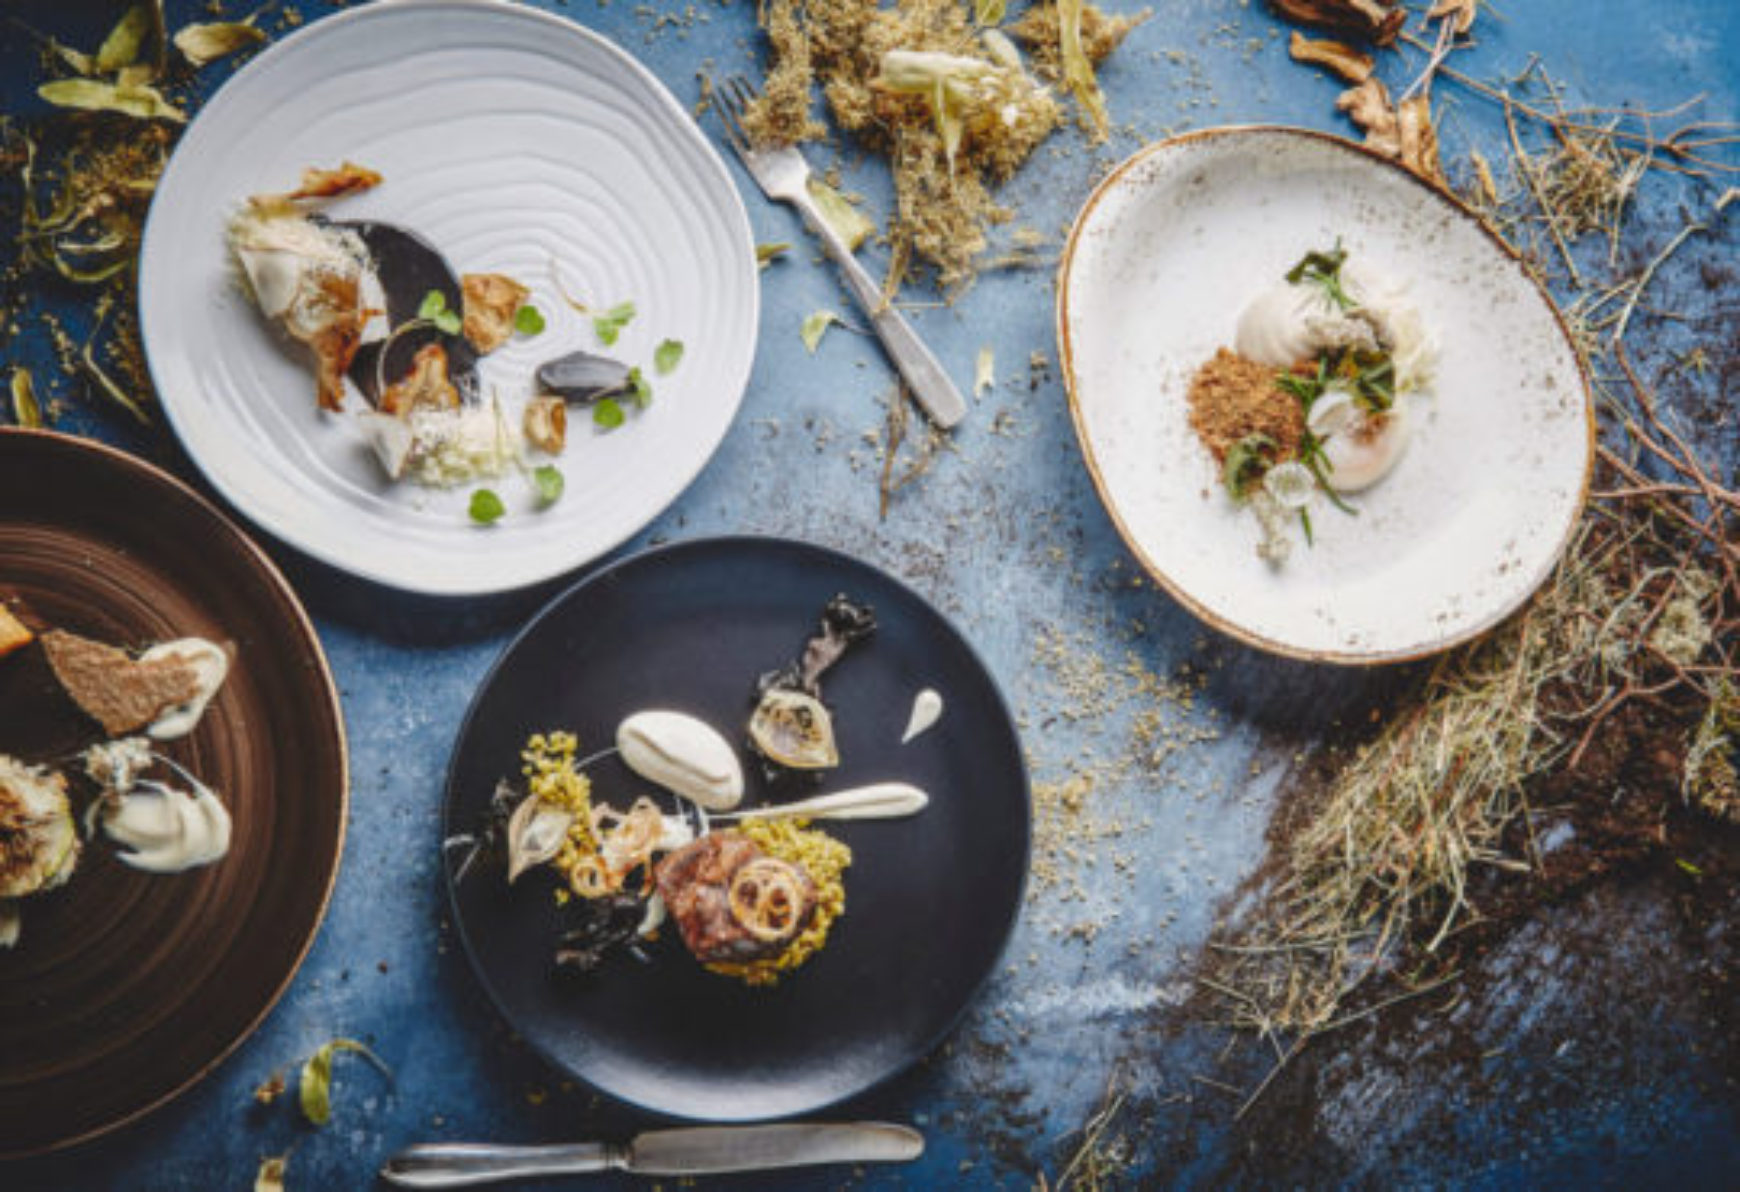 European Regions of Gastronomy shine as international foodie destinations